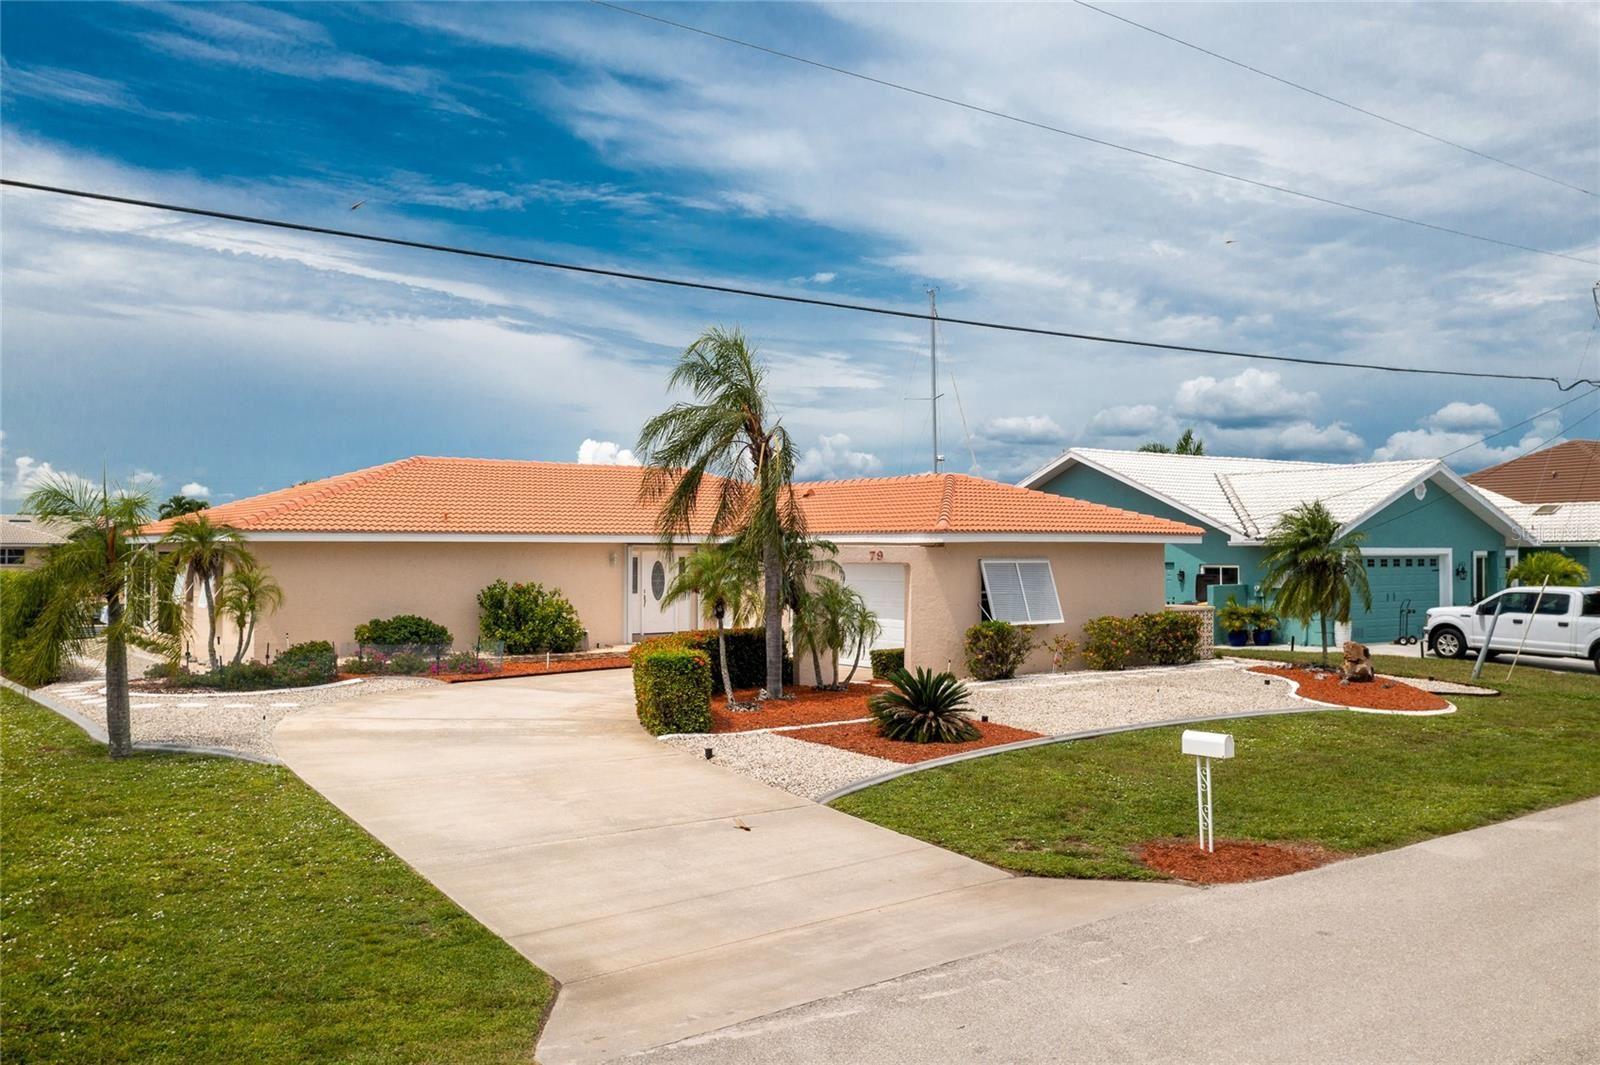 79 TROPICANA DRIVE, Punta Gorda, FL 33950 - #: C7448712